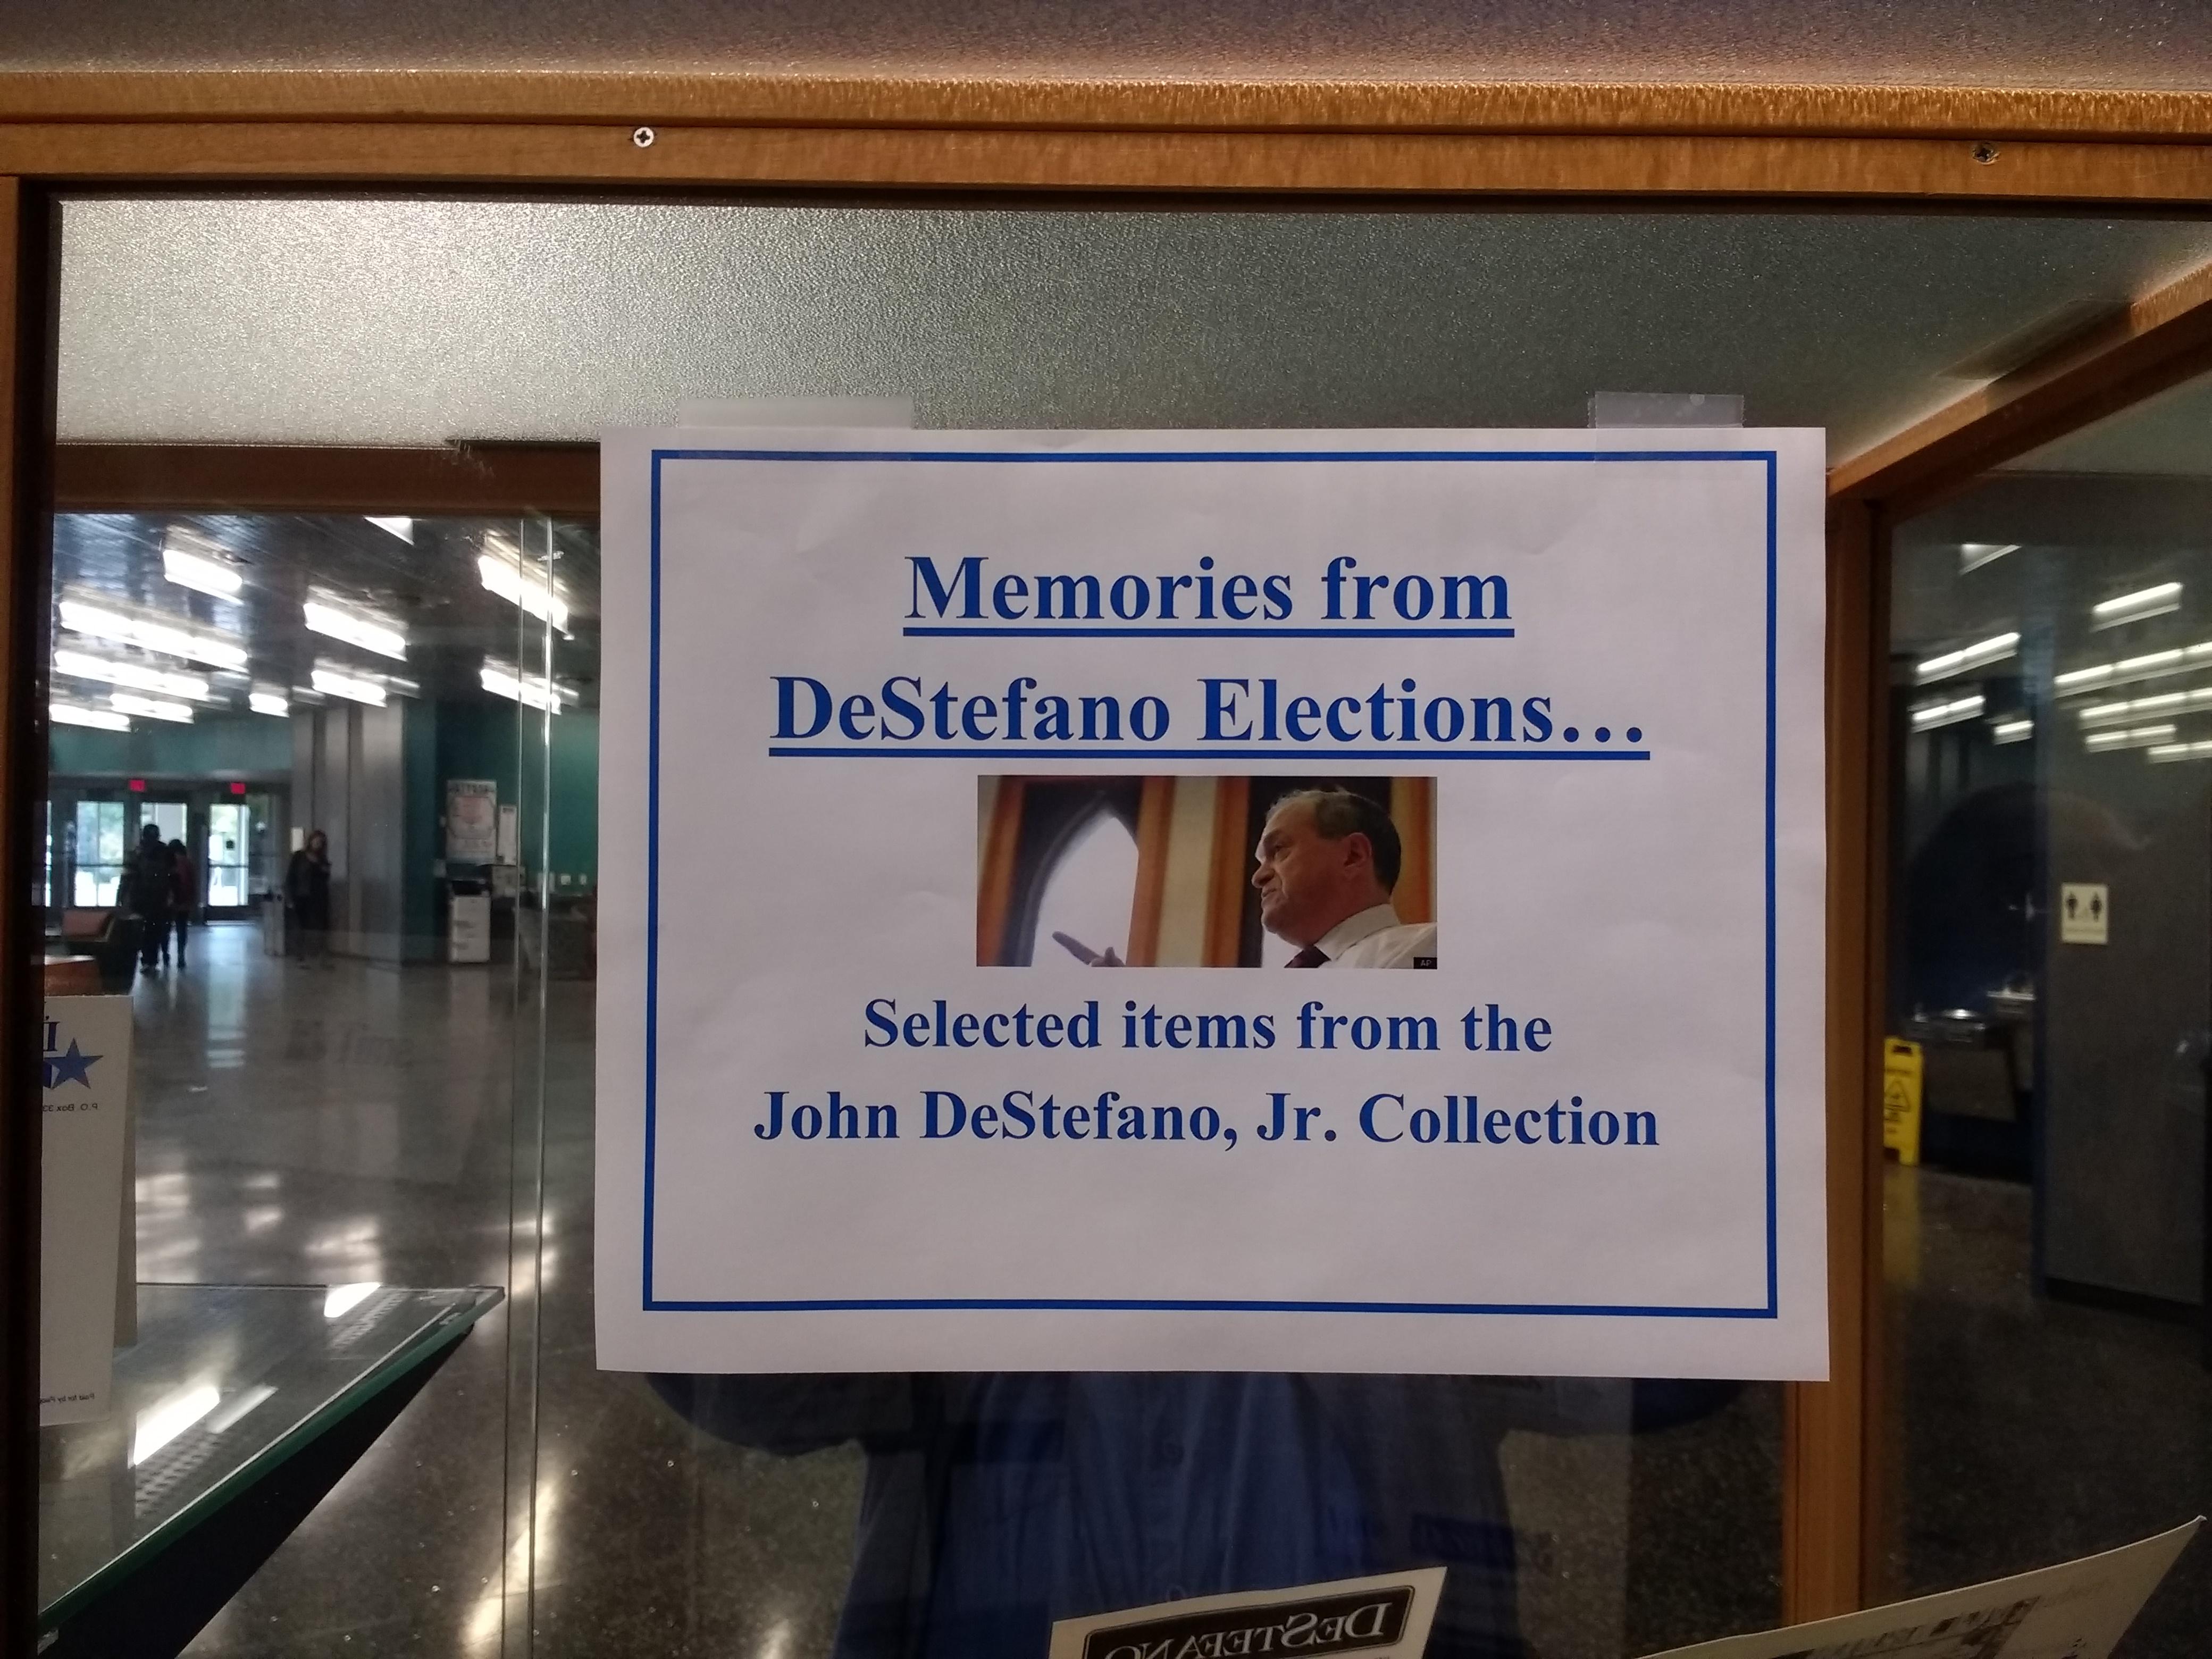 Title plaque for Memories from DeStefano Elections exhibit